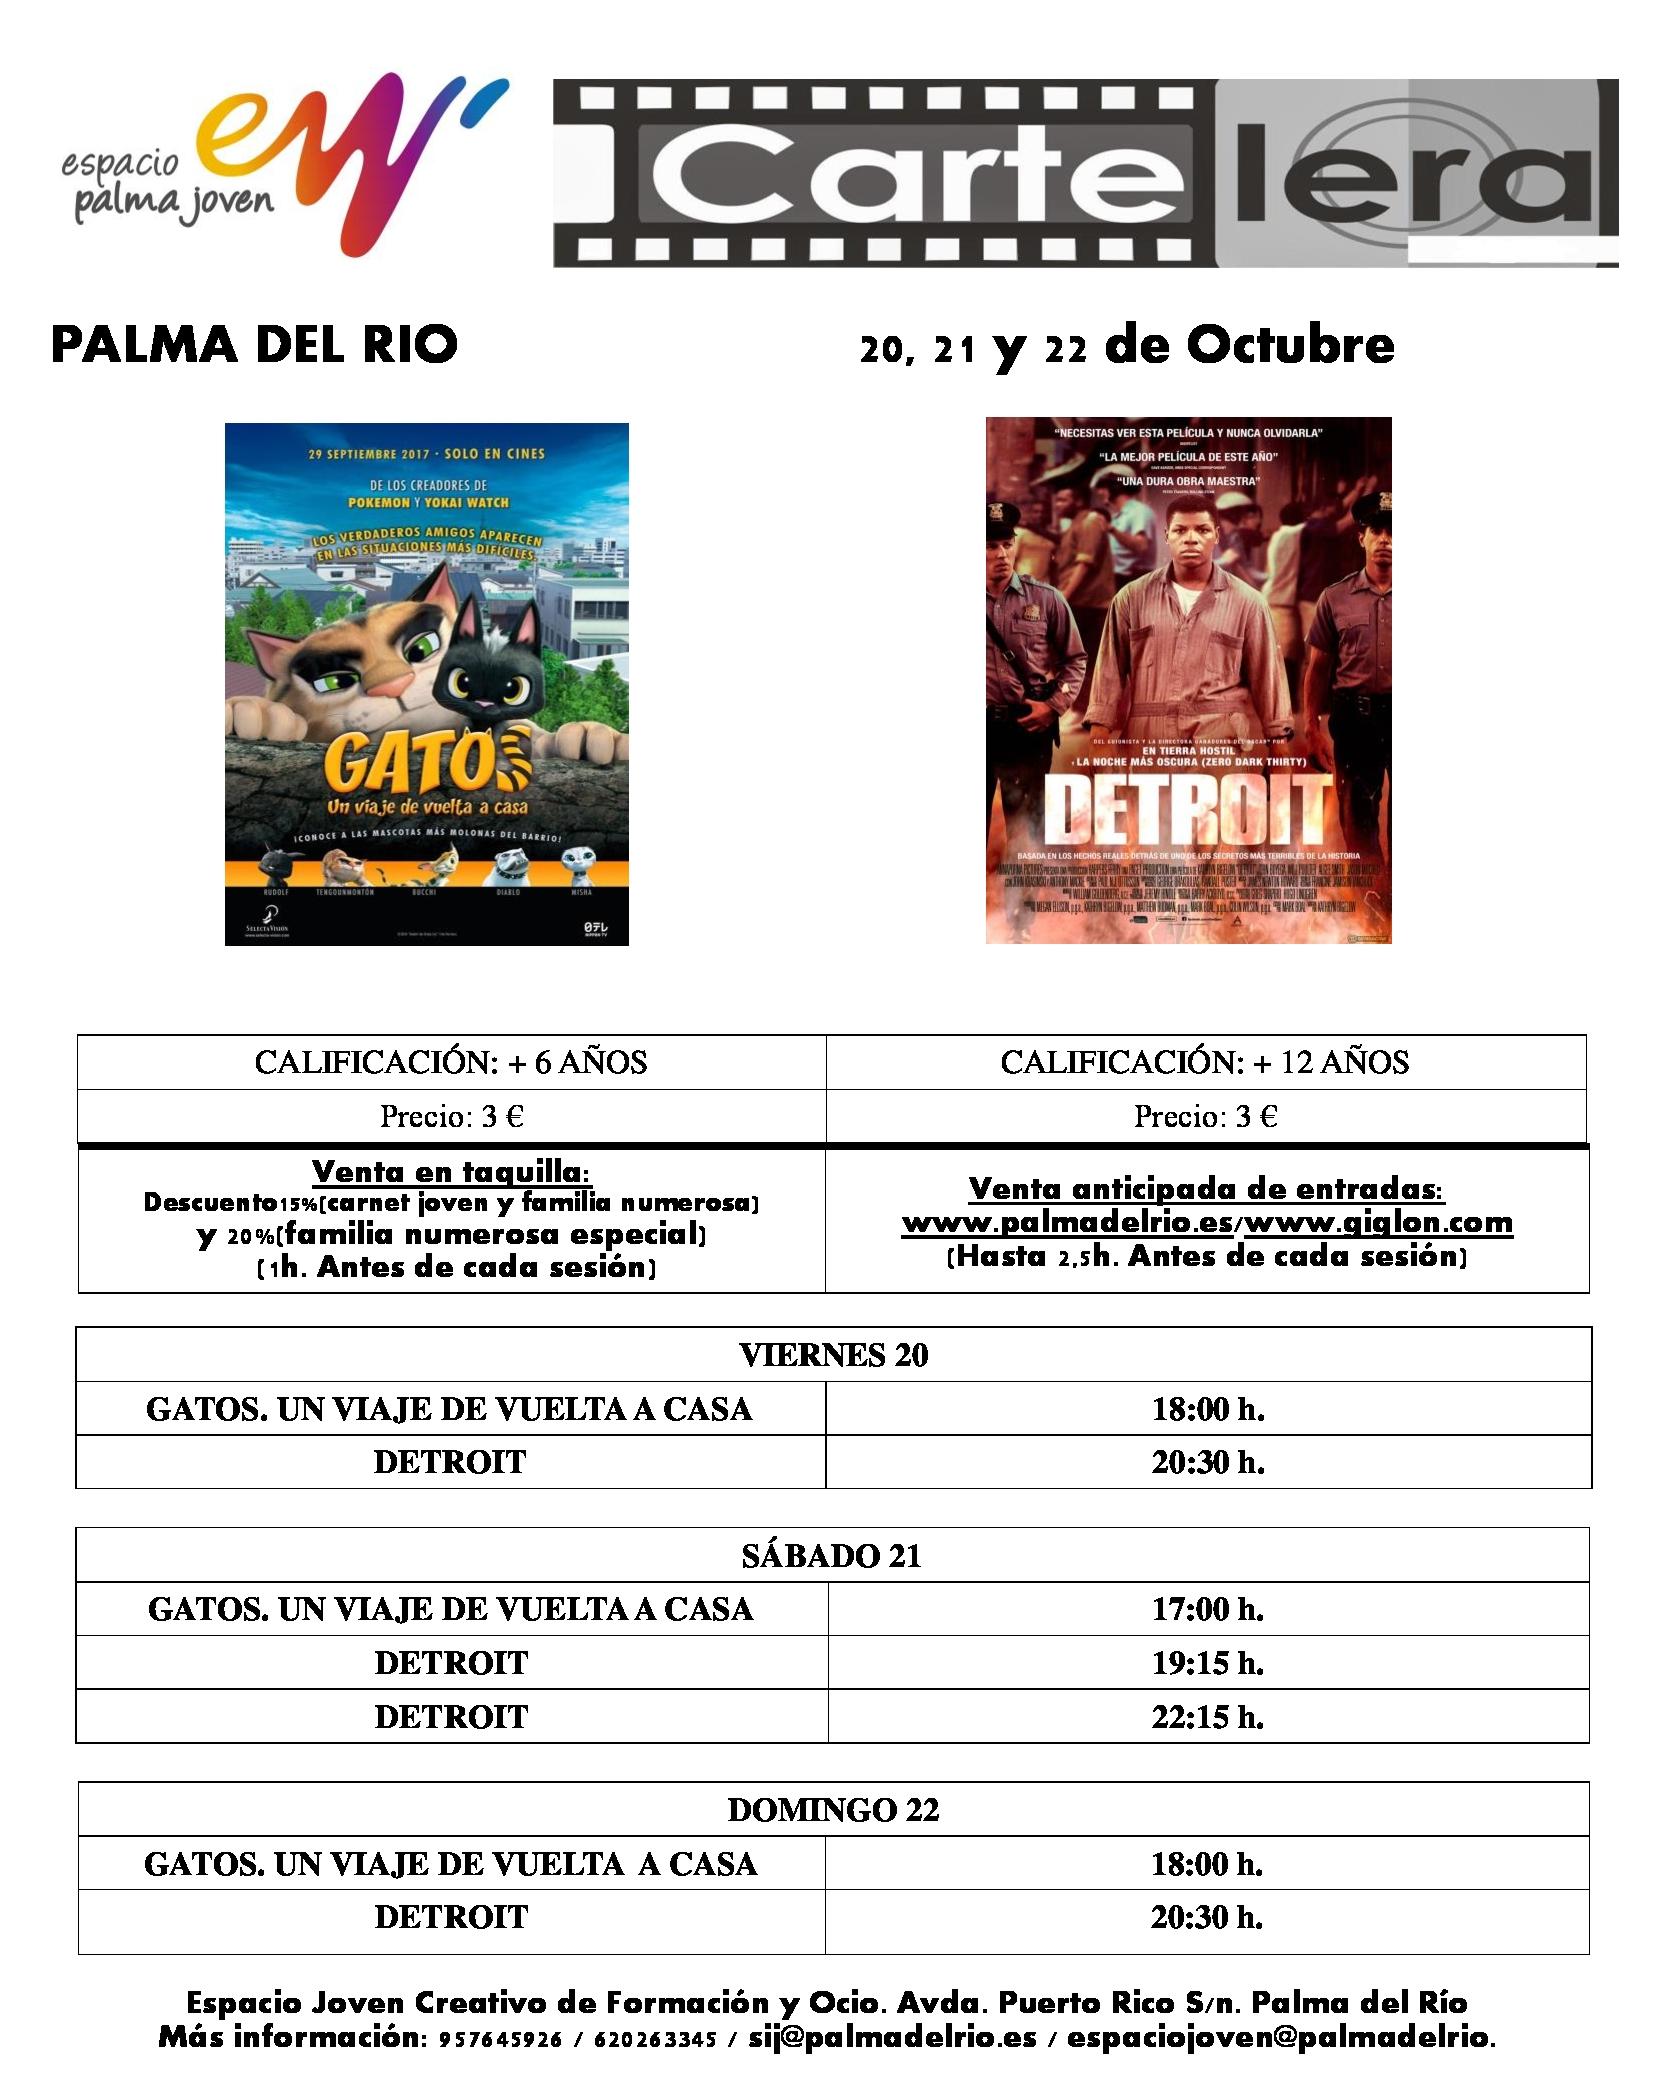 https://www.palmadelrio.es/sites/default/files/cine_20.21.22_octubre_2017_0.jpg